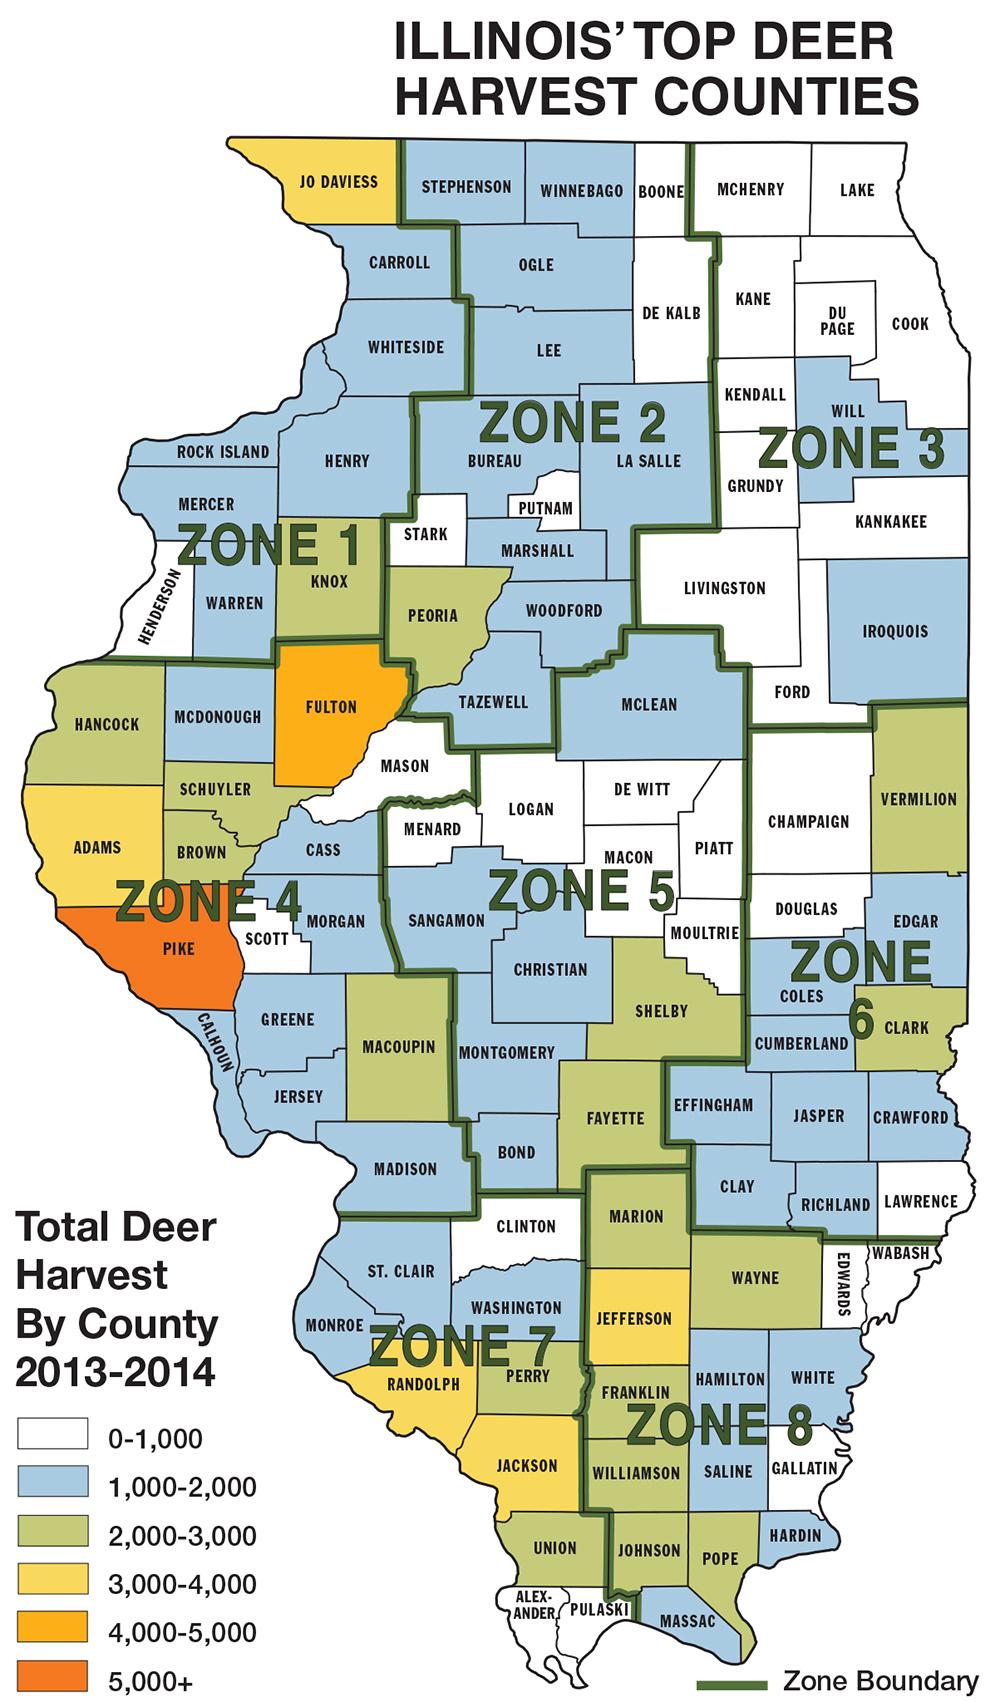 Illinois Deer Hunting Forecast For 2014 regarding Illinois Deer Rut Prediction For 2020